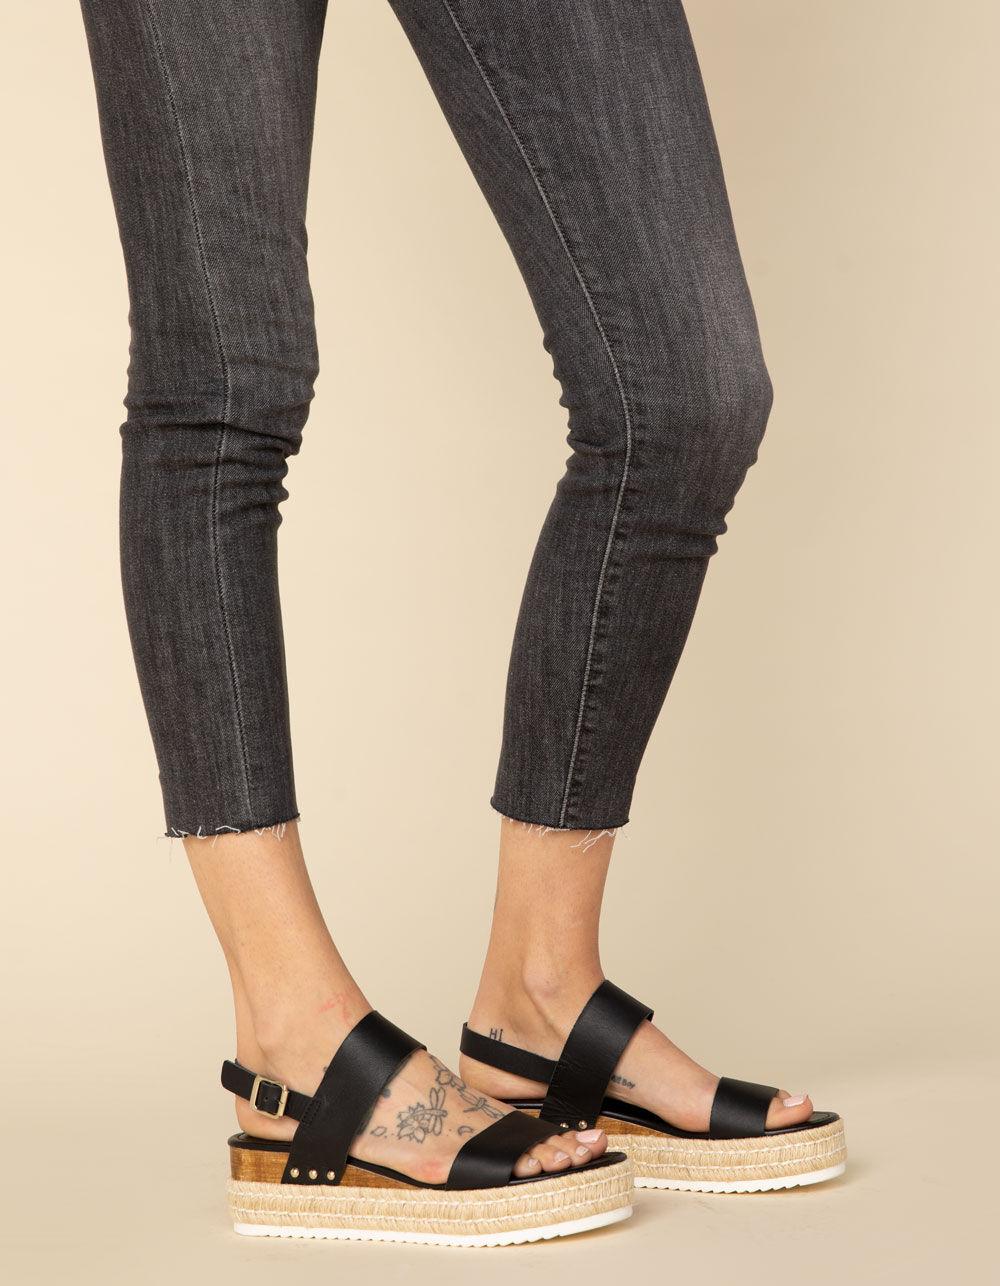 STEVE MADDEN Catia Black Espadrille Flatform Sandals